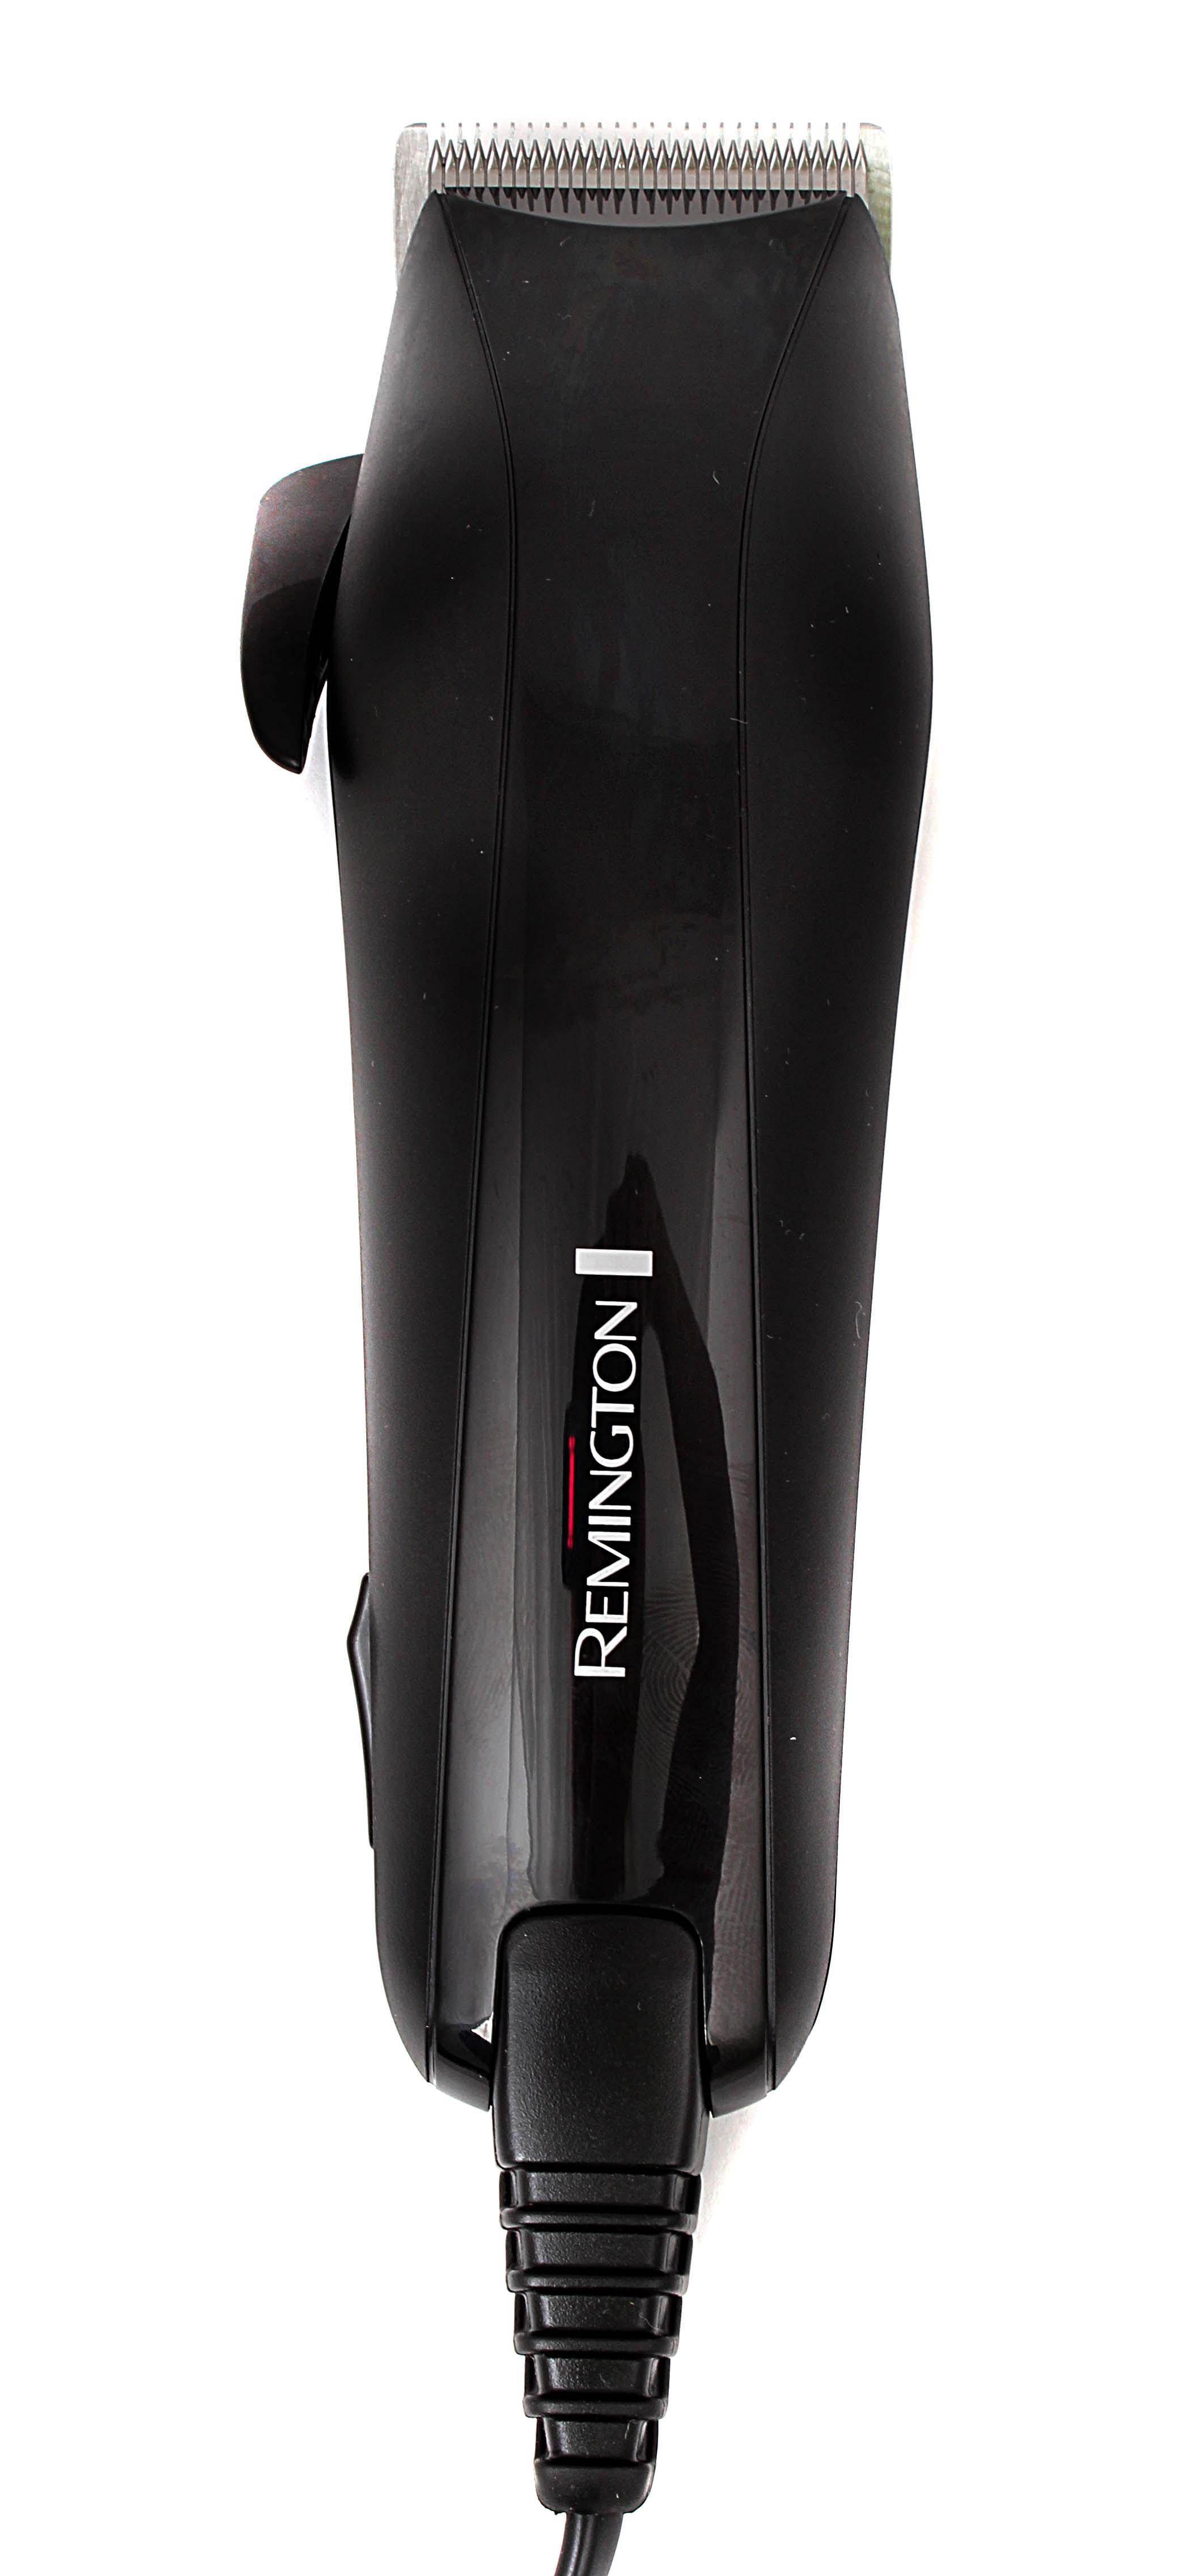 Машинки для стрижки Remington Real Brand Technics 794.000